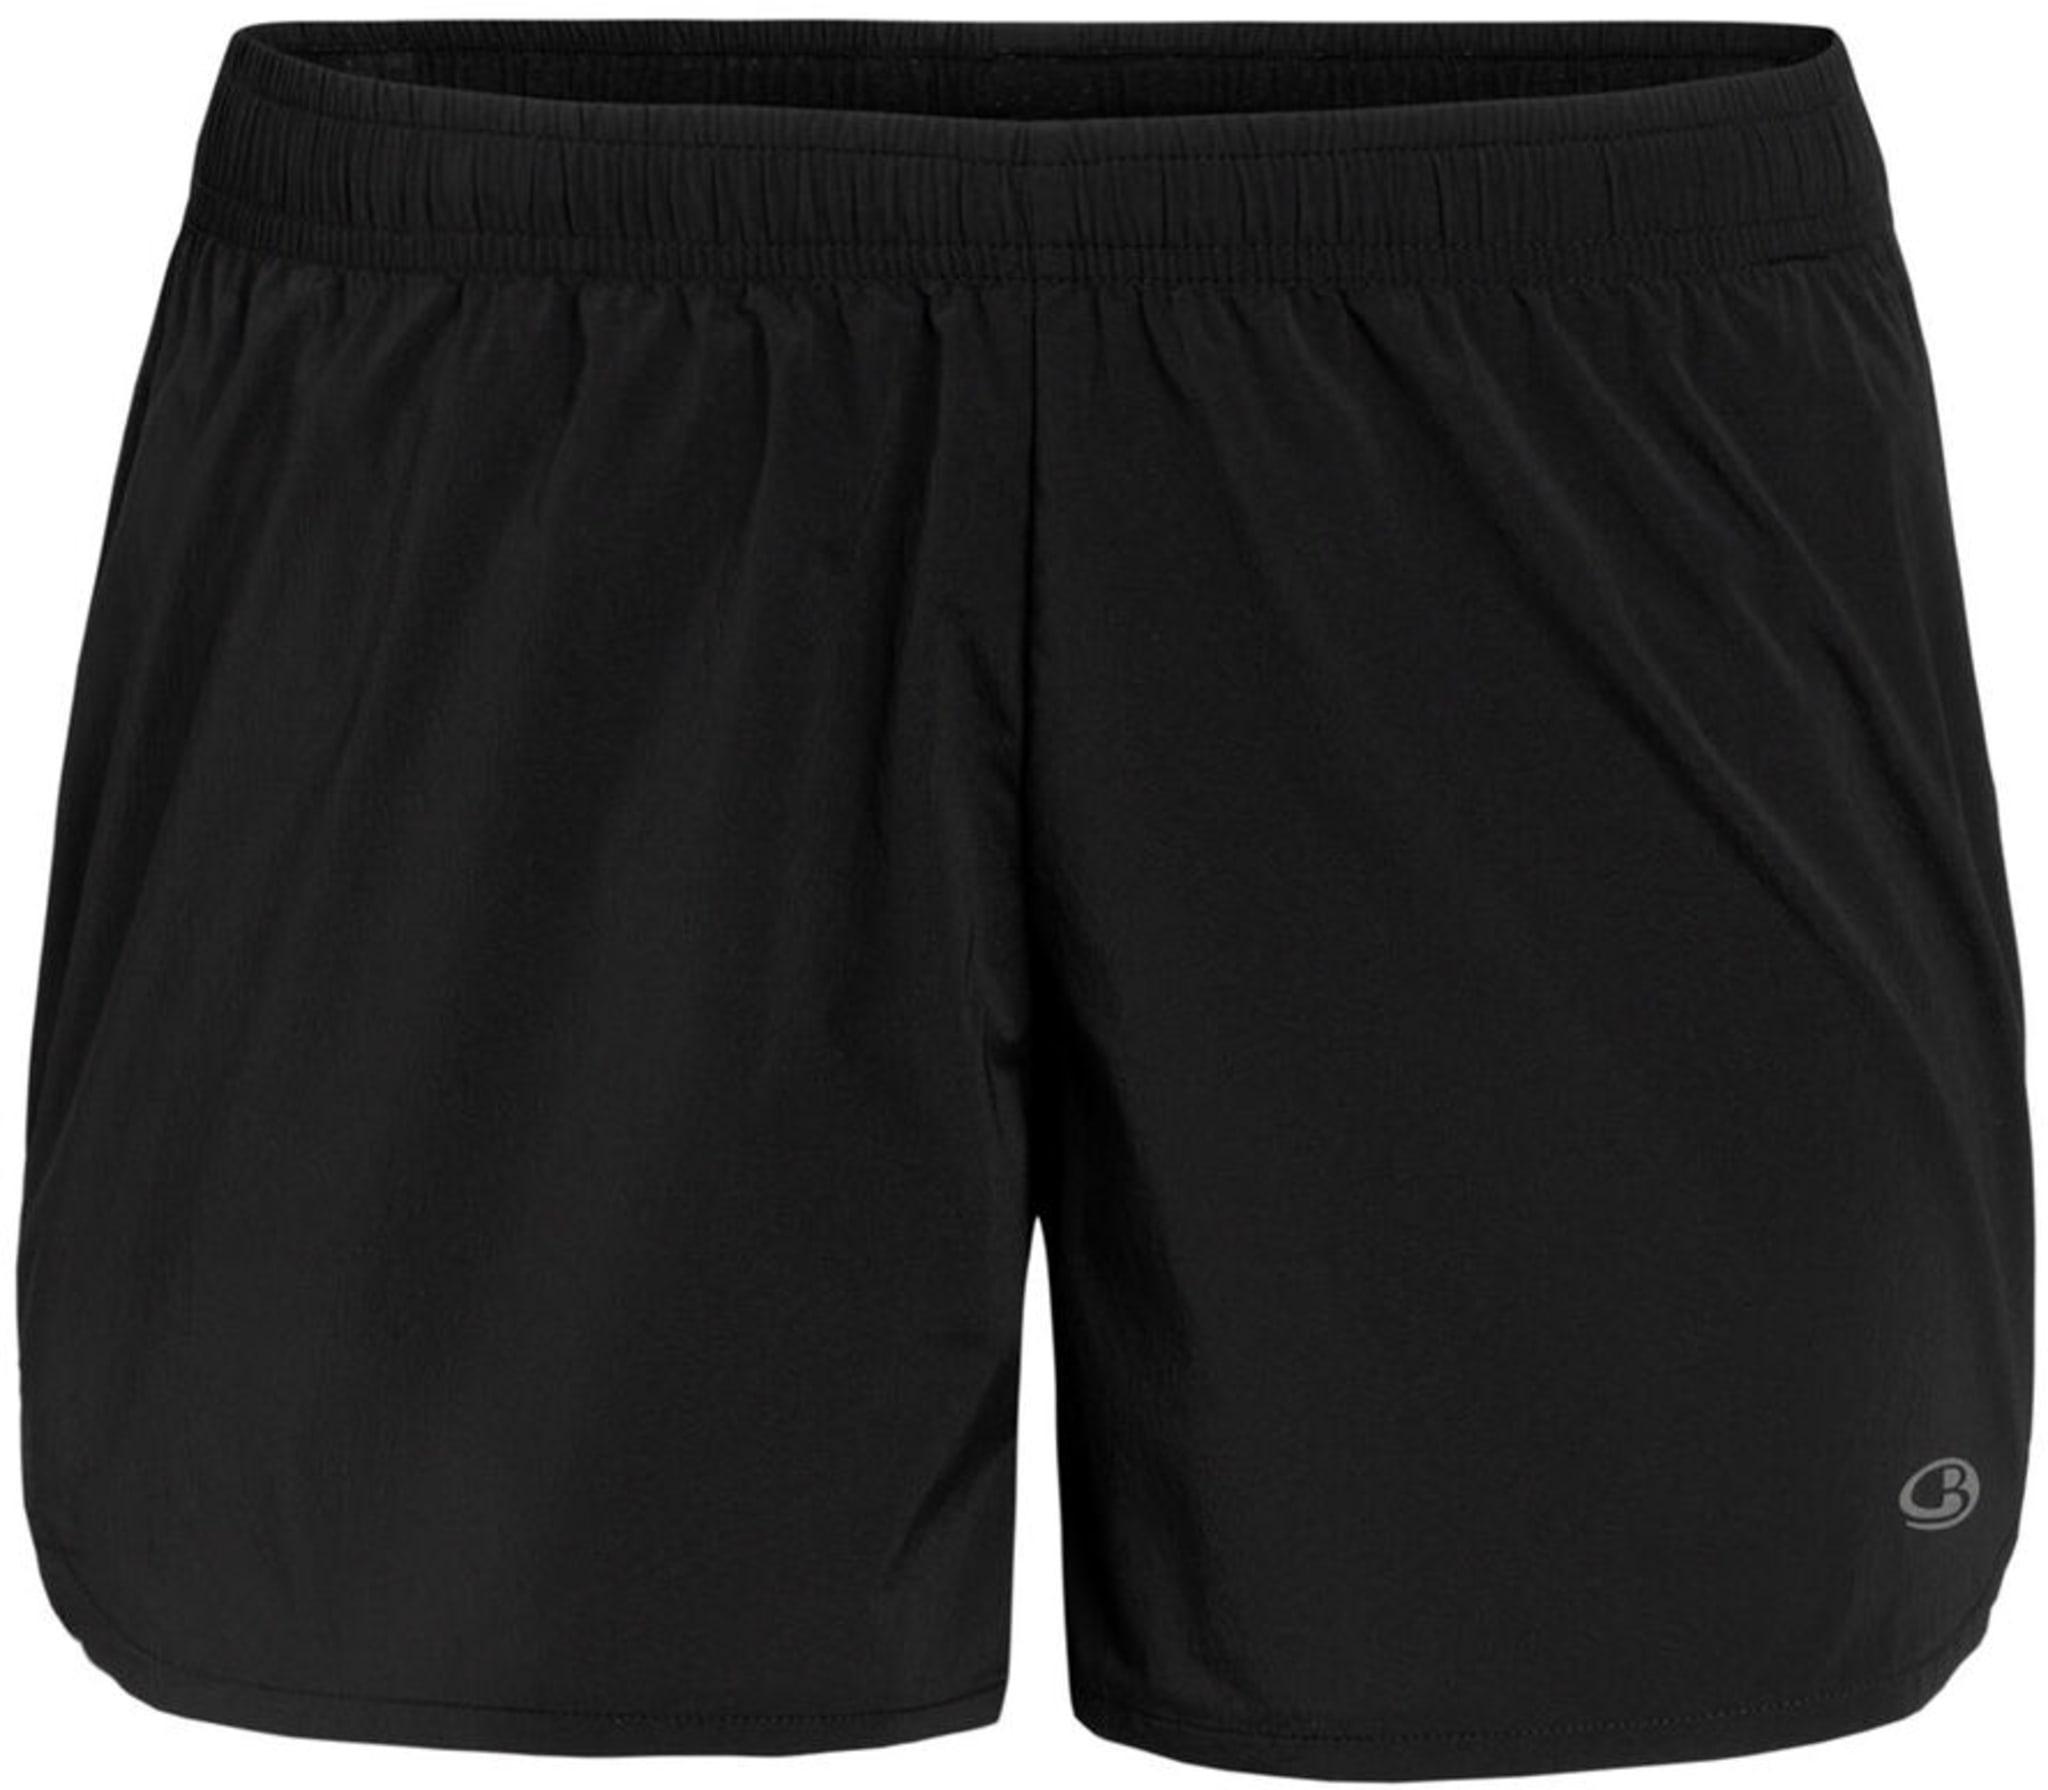 W Impulse Running Shorts